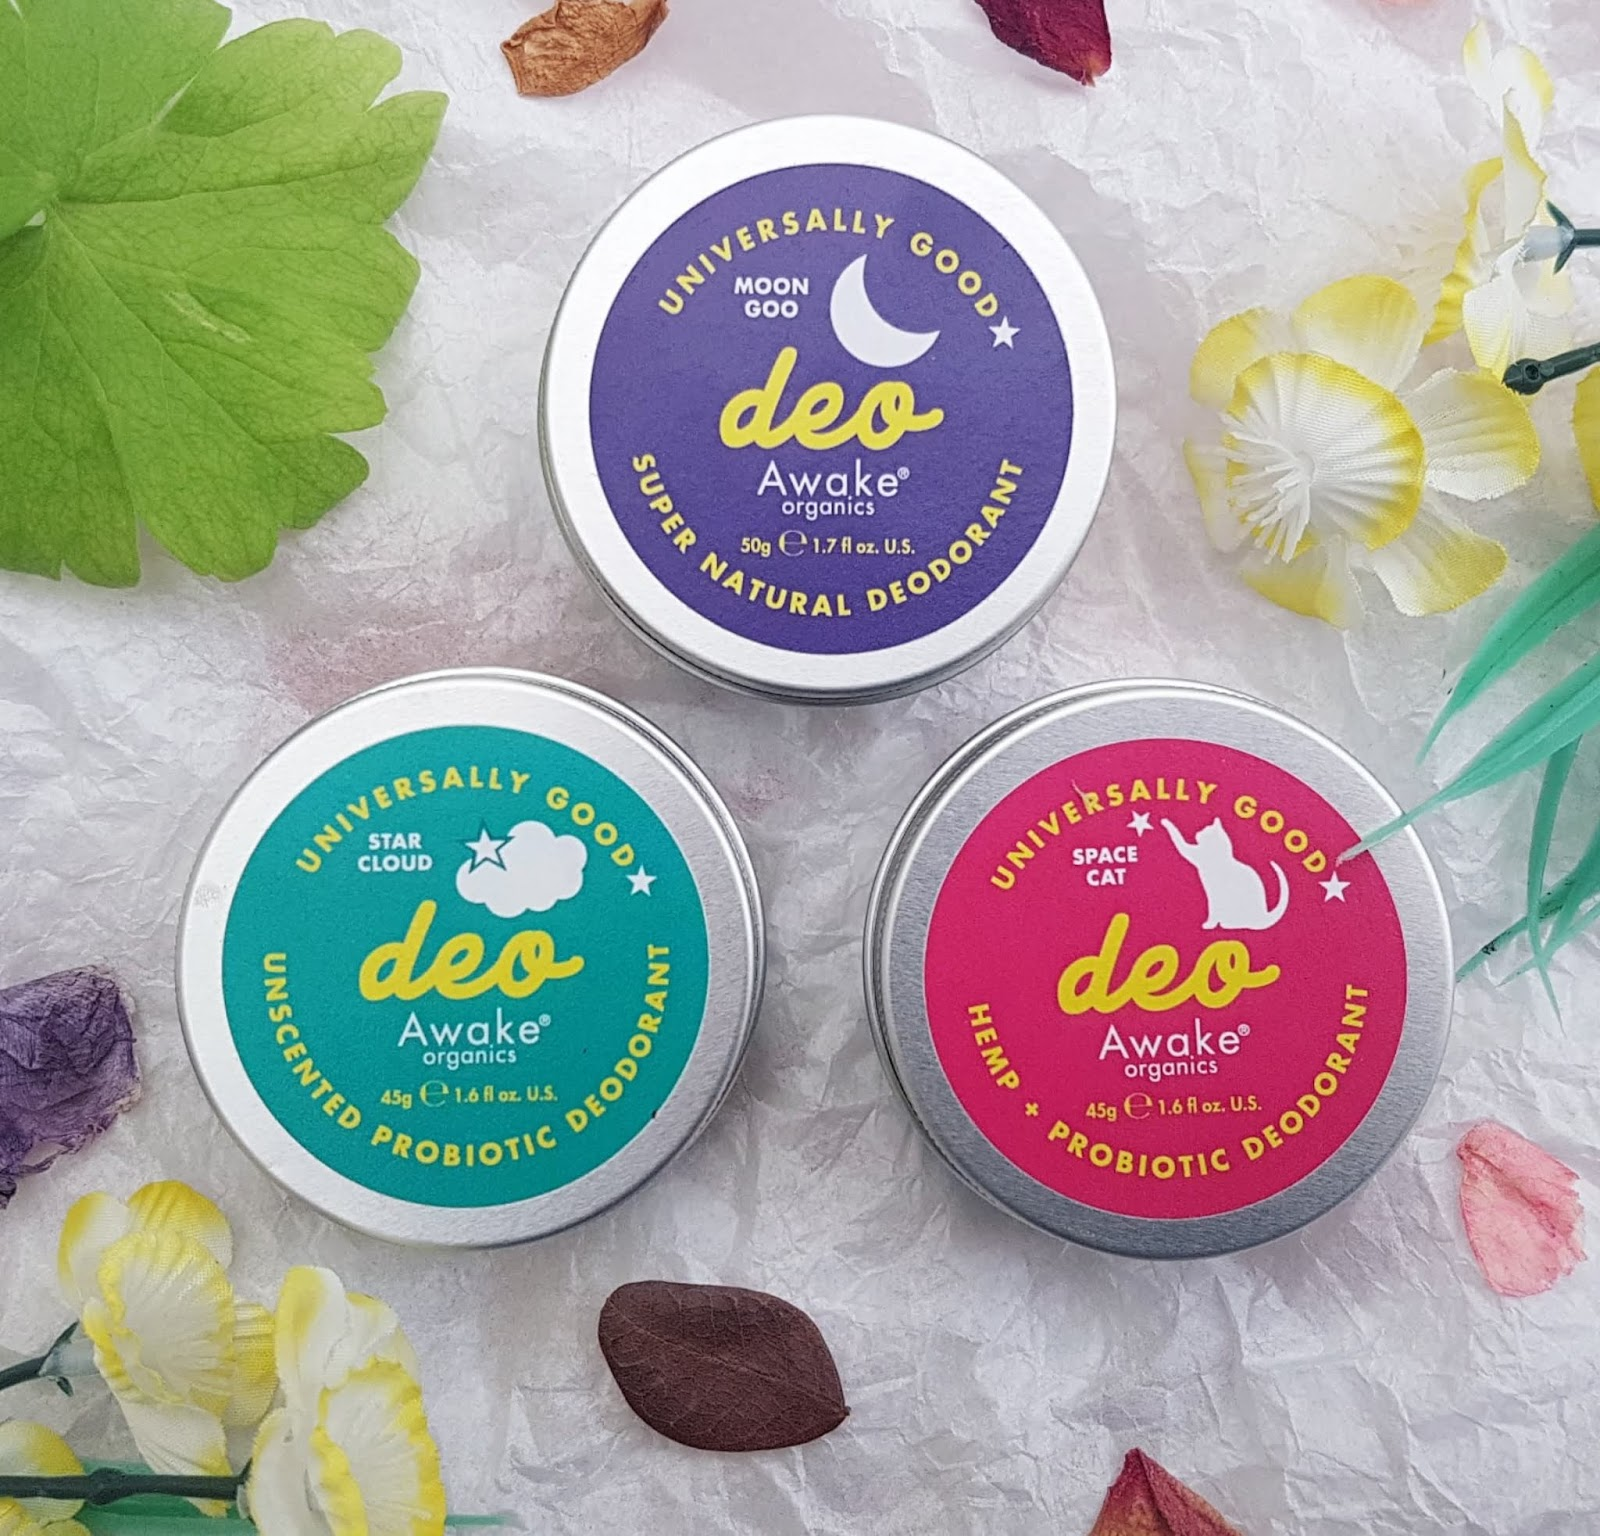 Awake Organics Natural Deodorant Review - Plastic Free Essentials